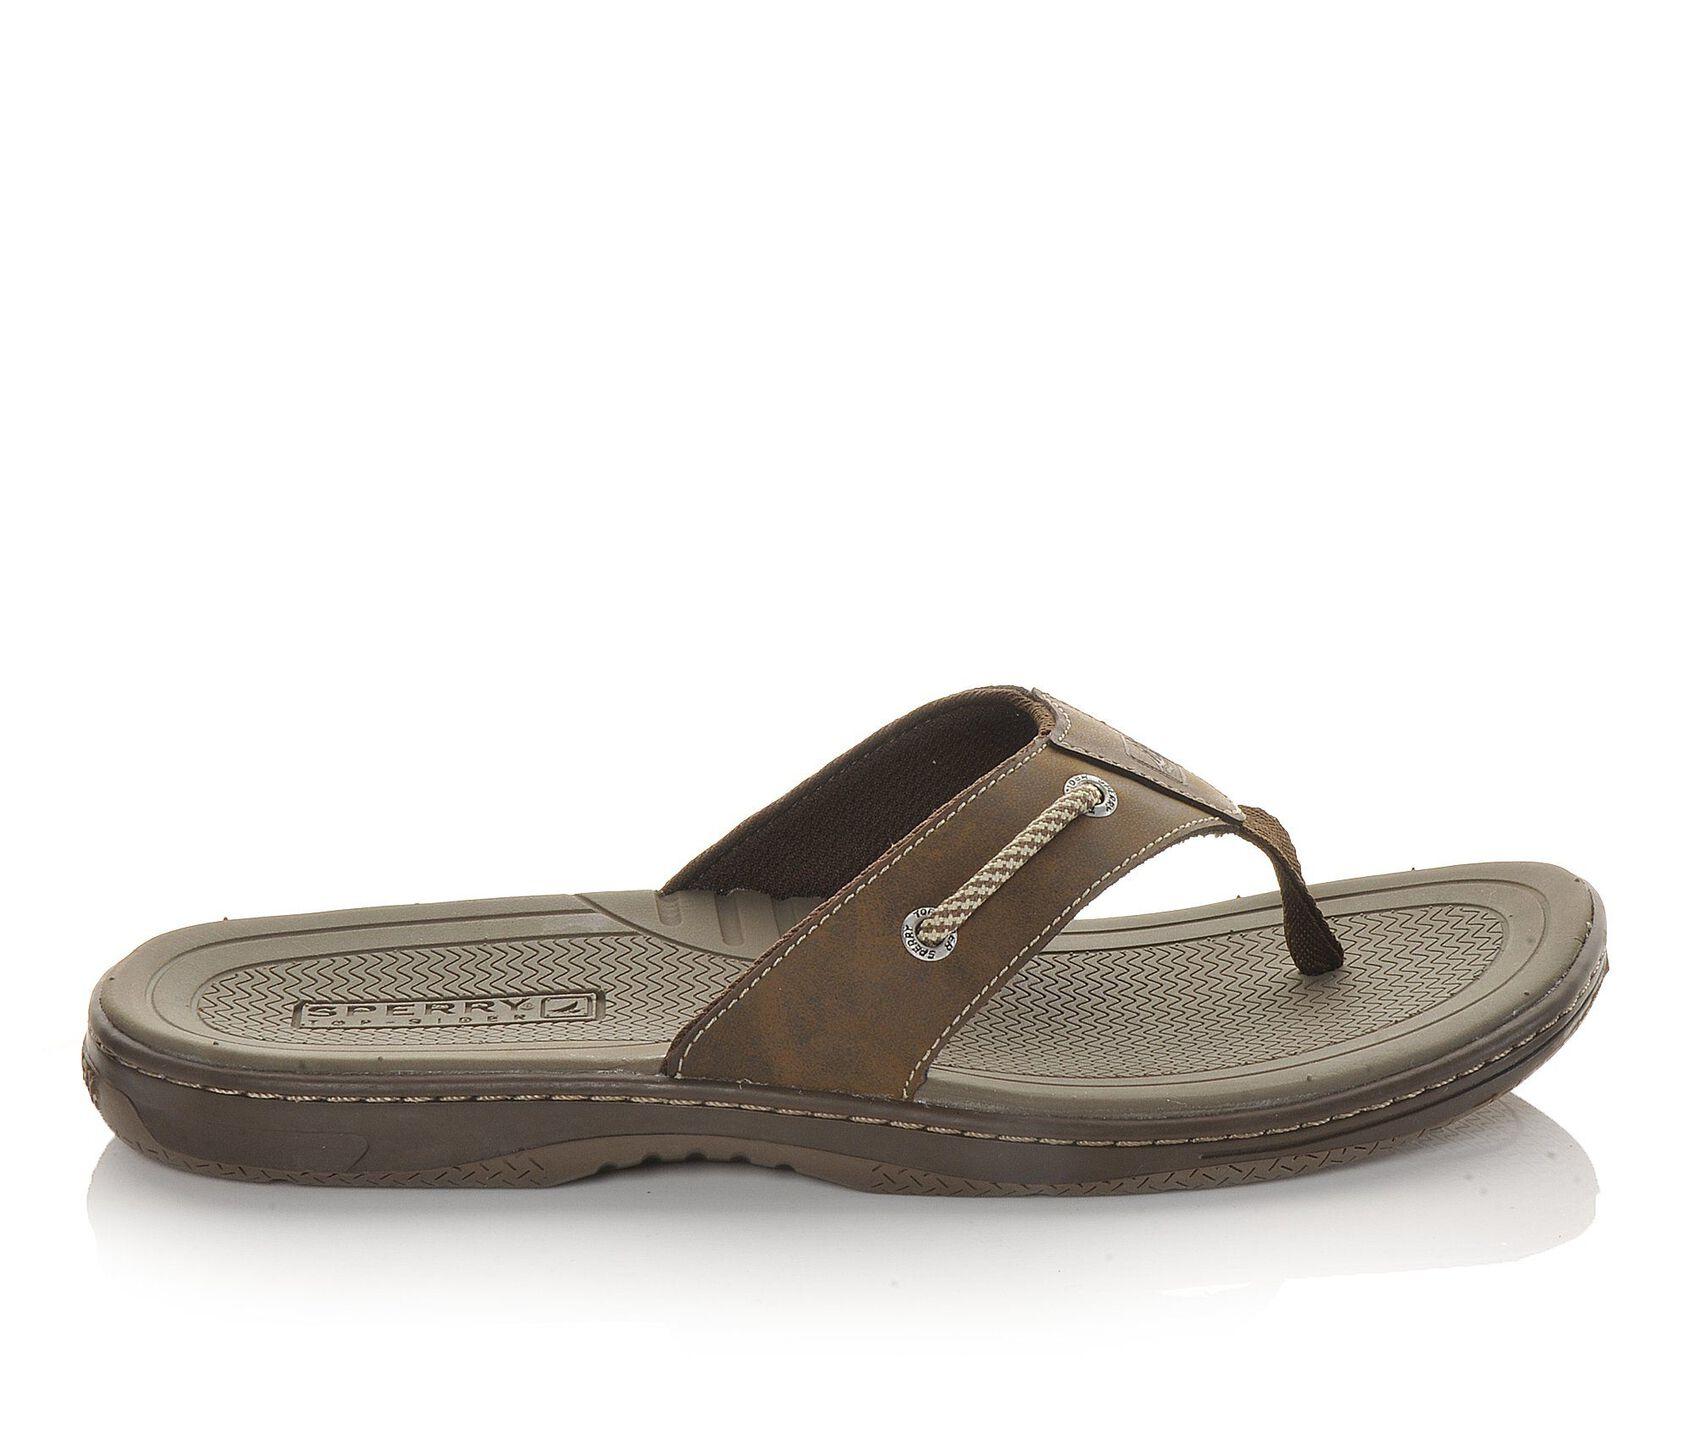 bdeff1305 ... Sperry Havasu Thong Flip-Flops. Previous